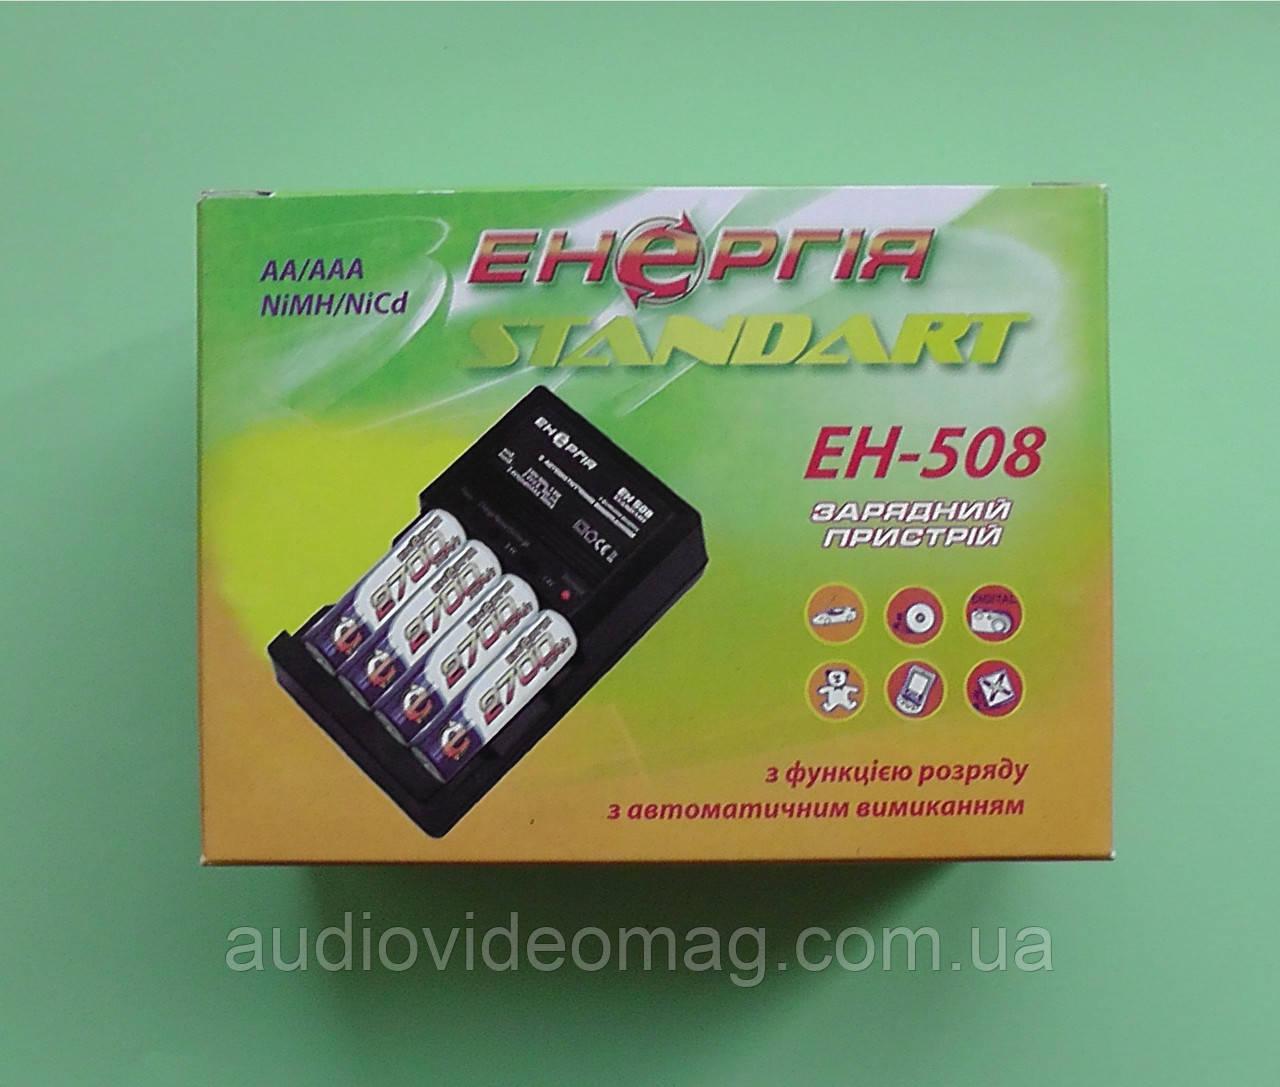 Зарядное устройство-автомат для акумуляторов АА, ААА